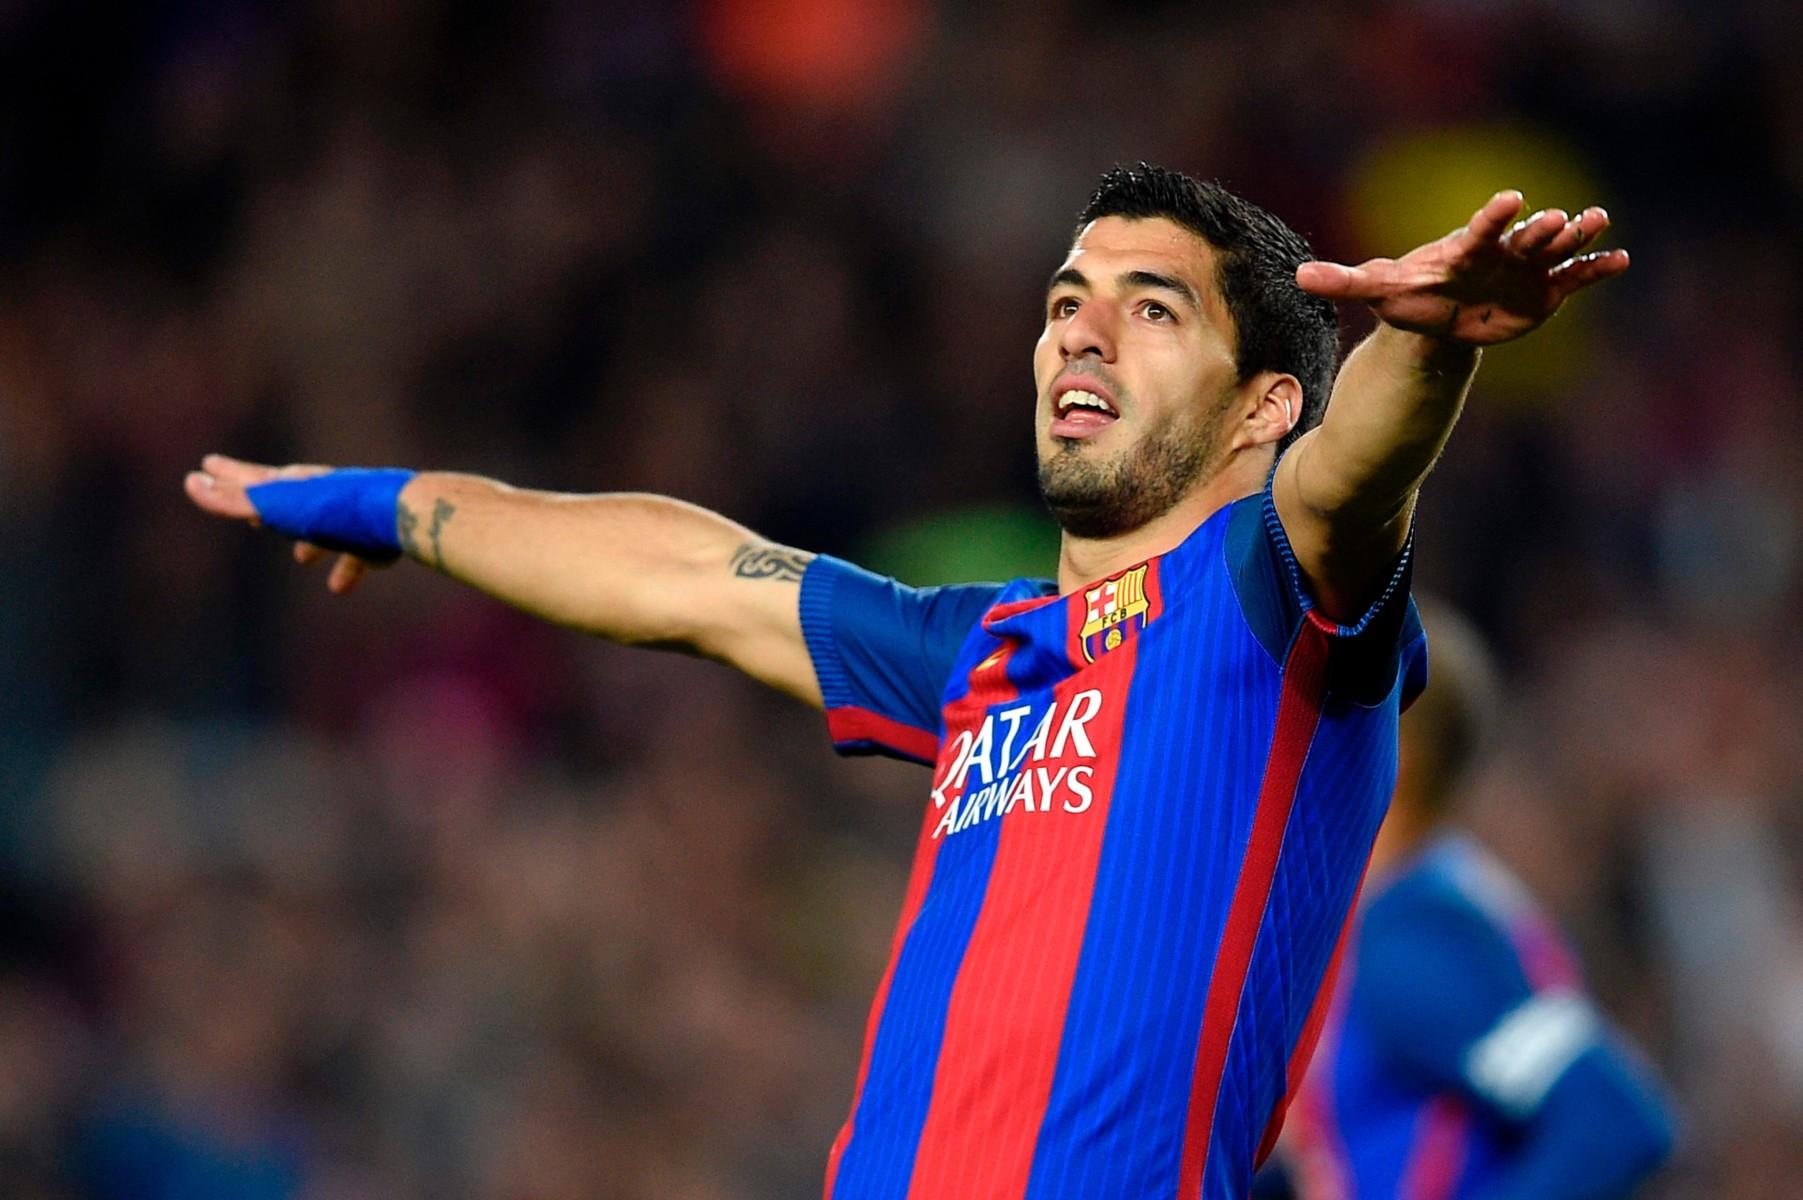 Barcelona ace Luis Suarez starts in attack